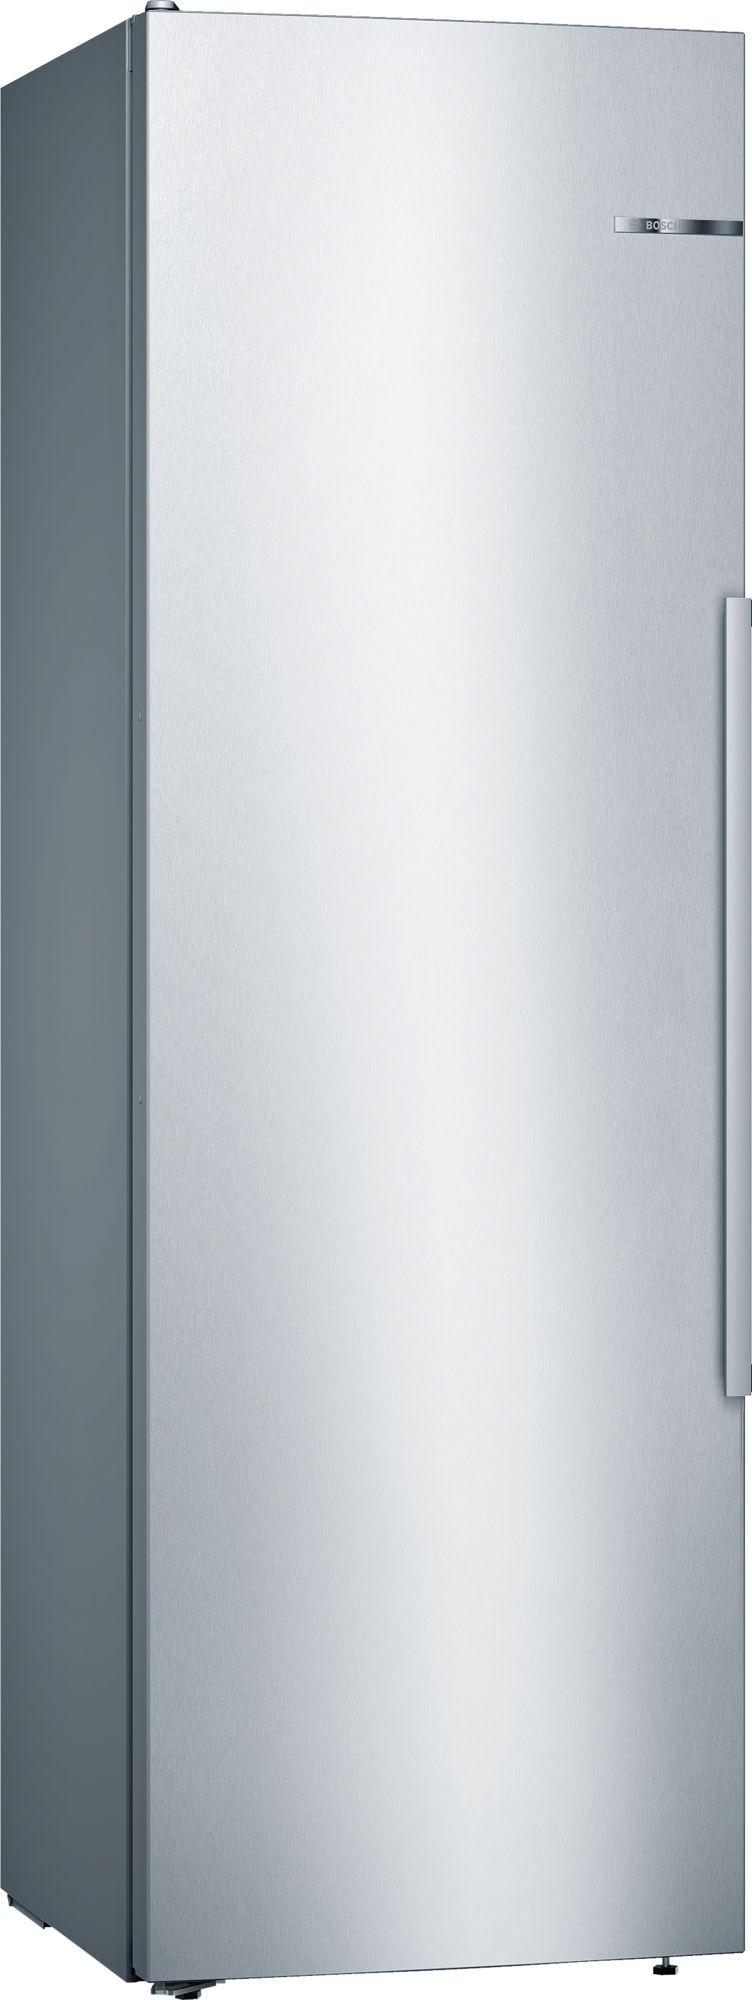 Bosch Stand Kühlschrank Türen Edelstahl Mit Anti Fingerprint KSV36AI4P